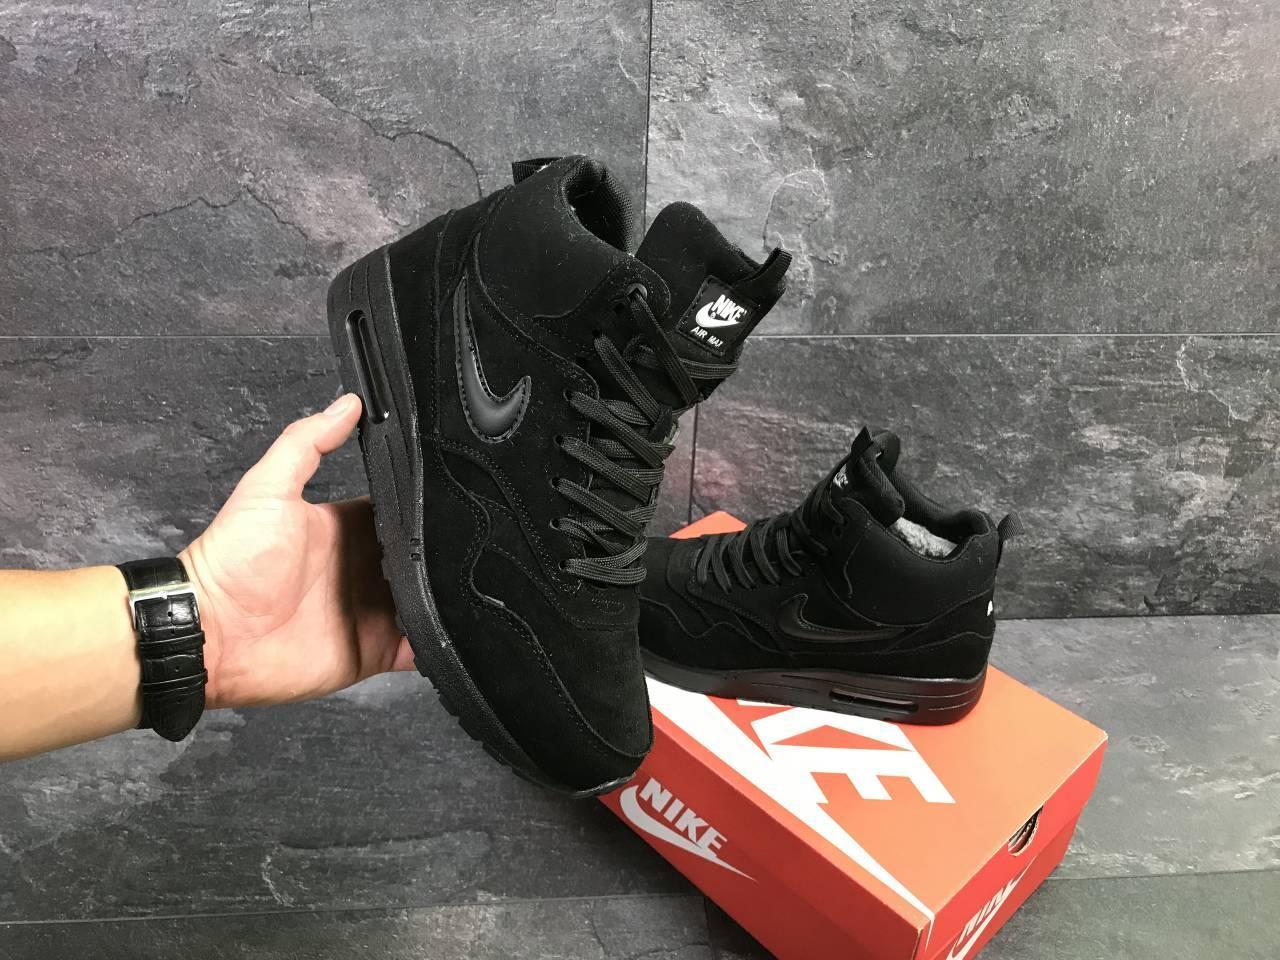 e406bc9a336a Мужские зимние кроссовки Nike Air Max 87 6759 черные  продажа, цена ...